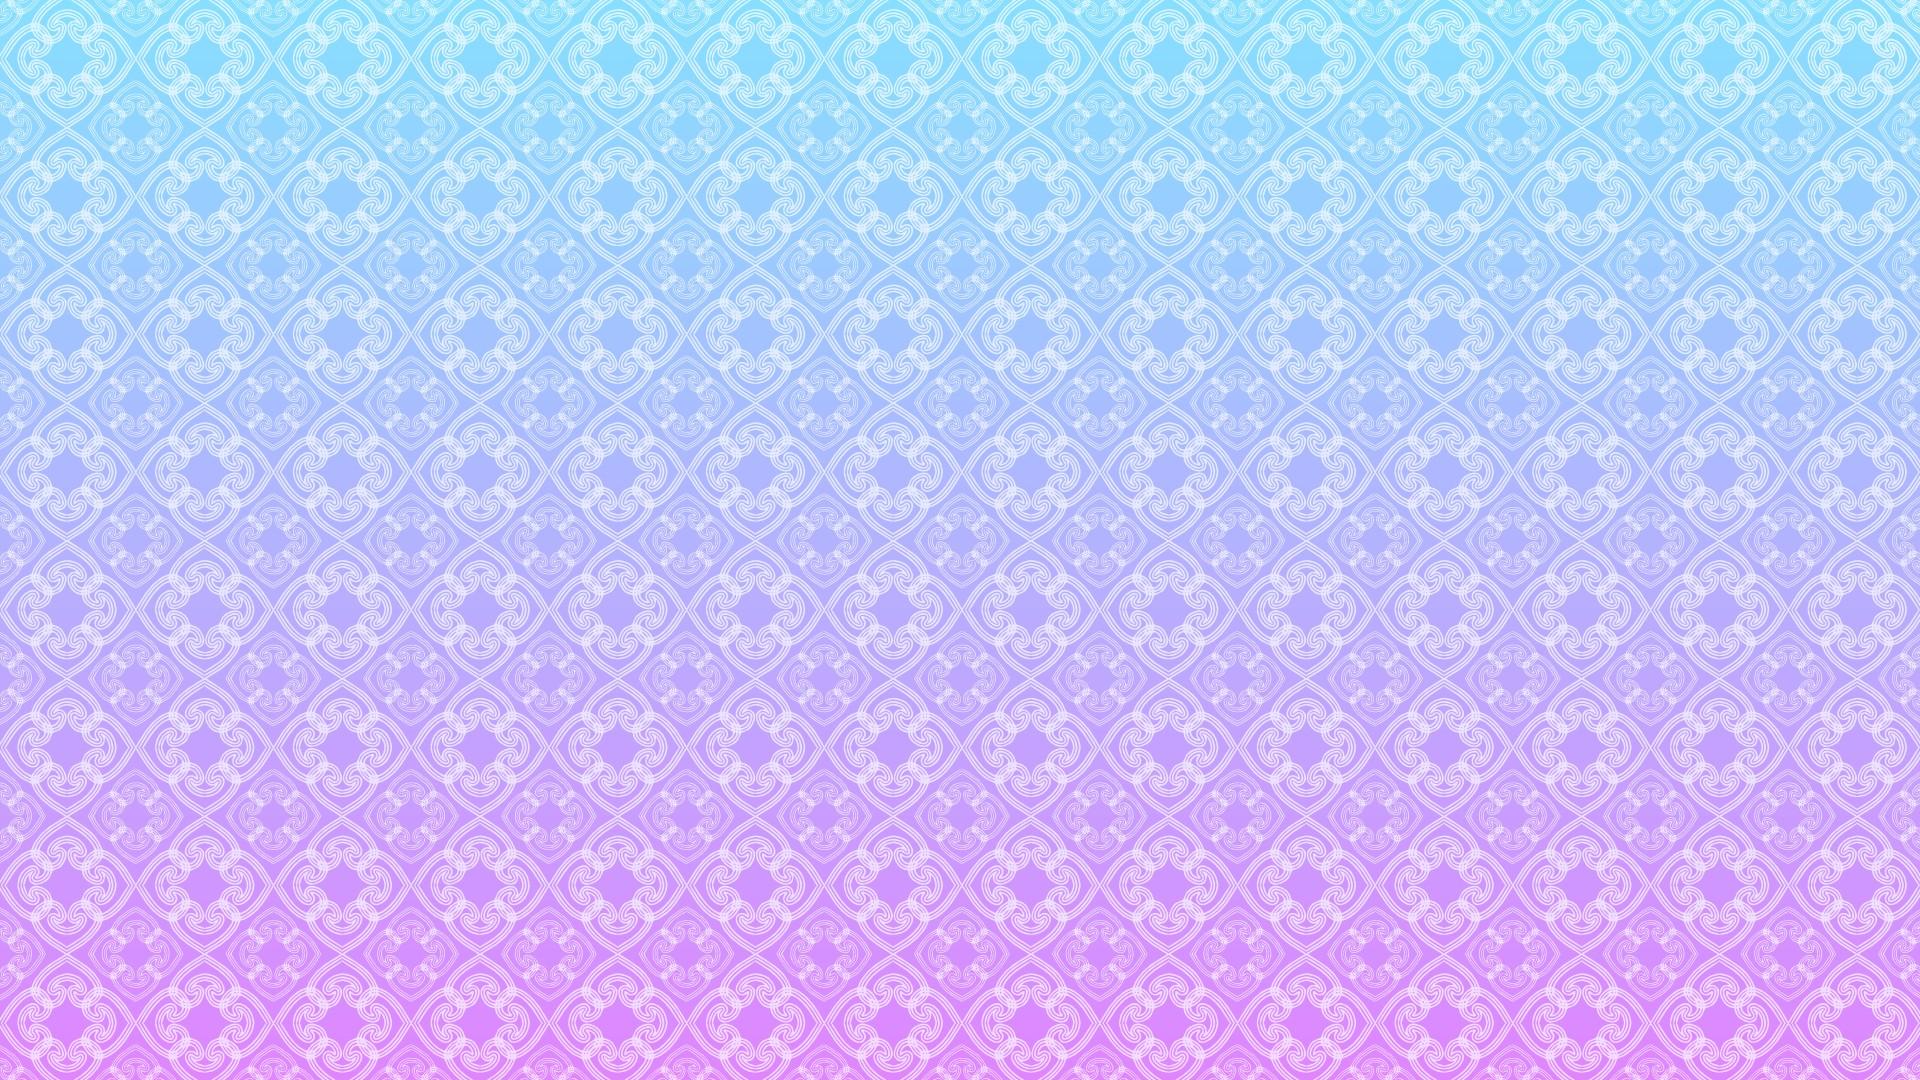 Patternblueandpurplehdwallpaperbyelideli Dvunta